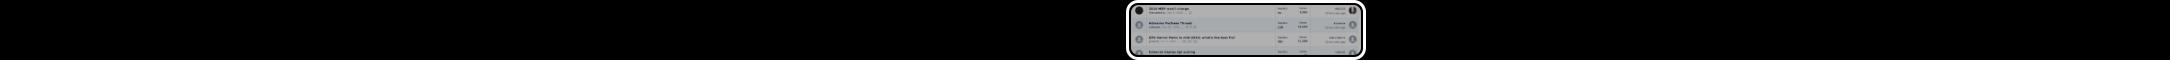 Screenshot 2017-01-04 20.34.34.png